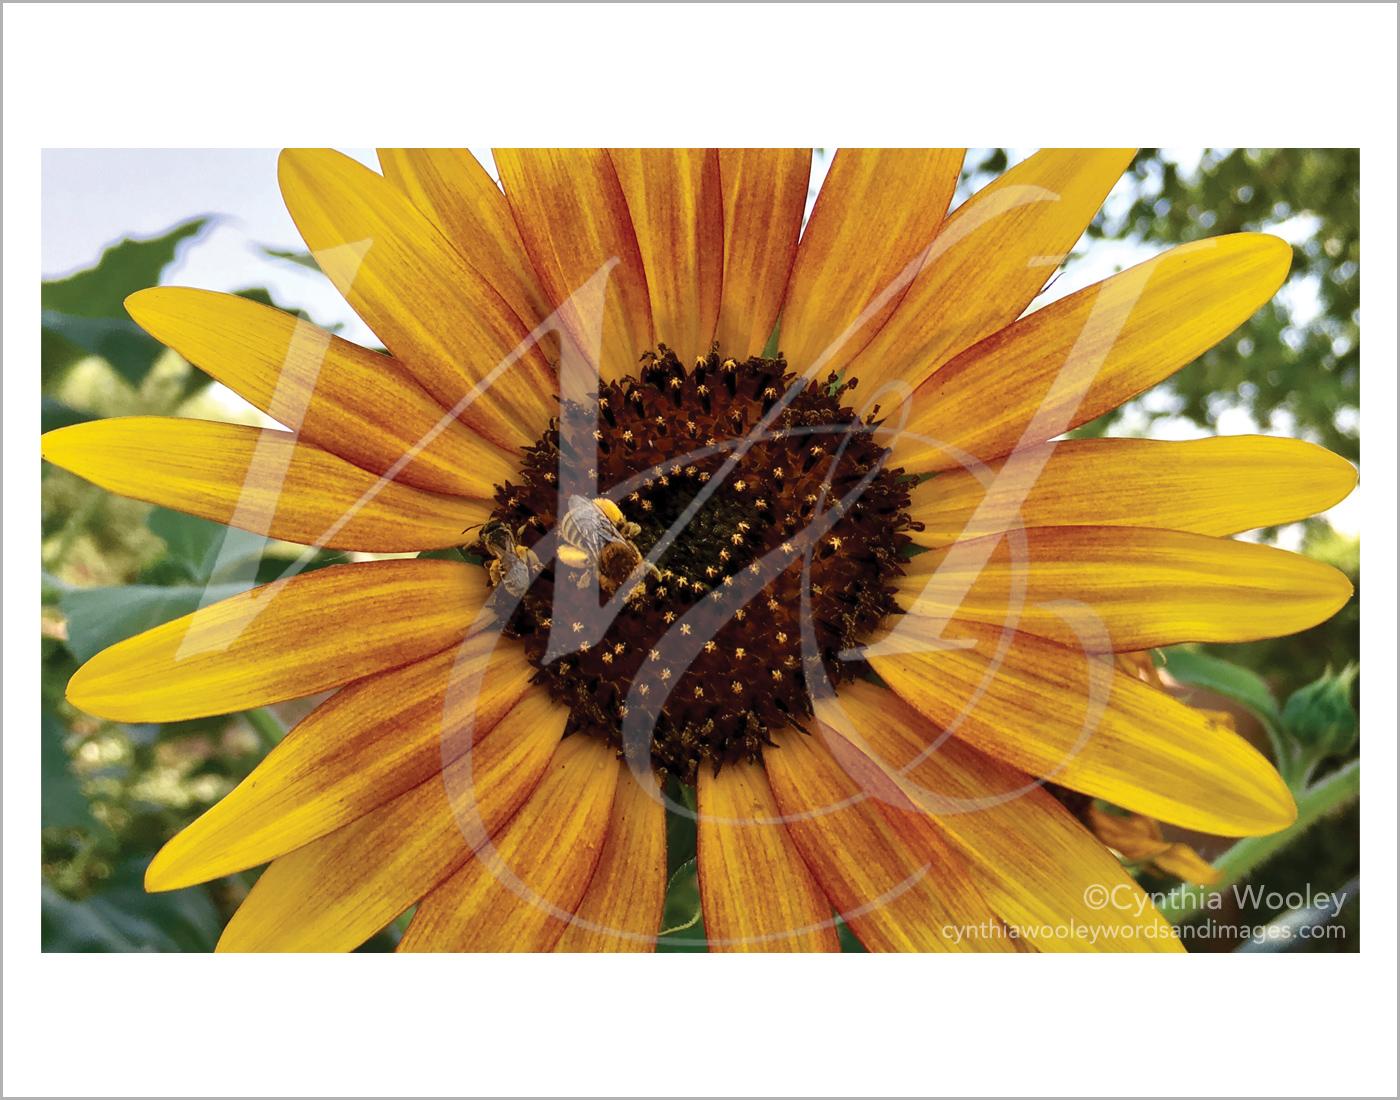 Gathering Pollen - New Mexico: Print